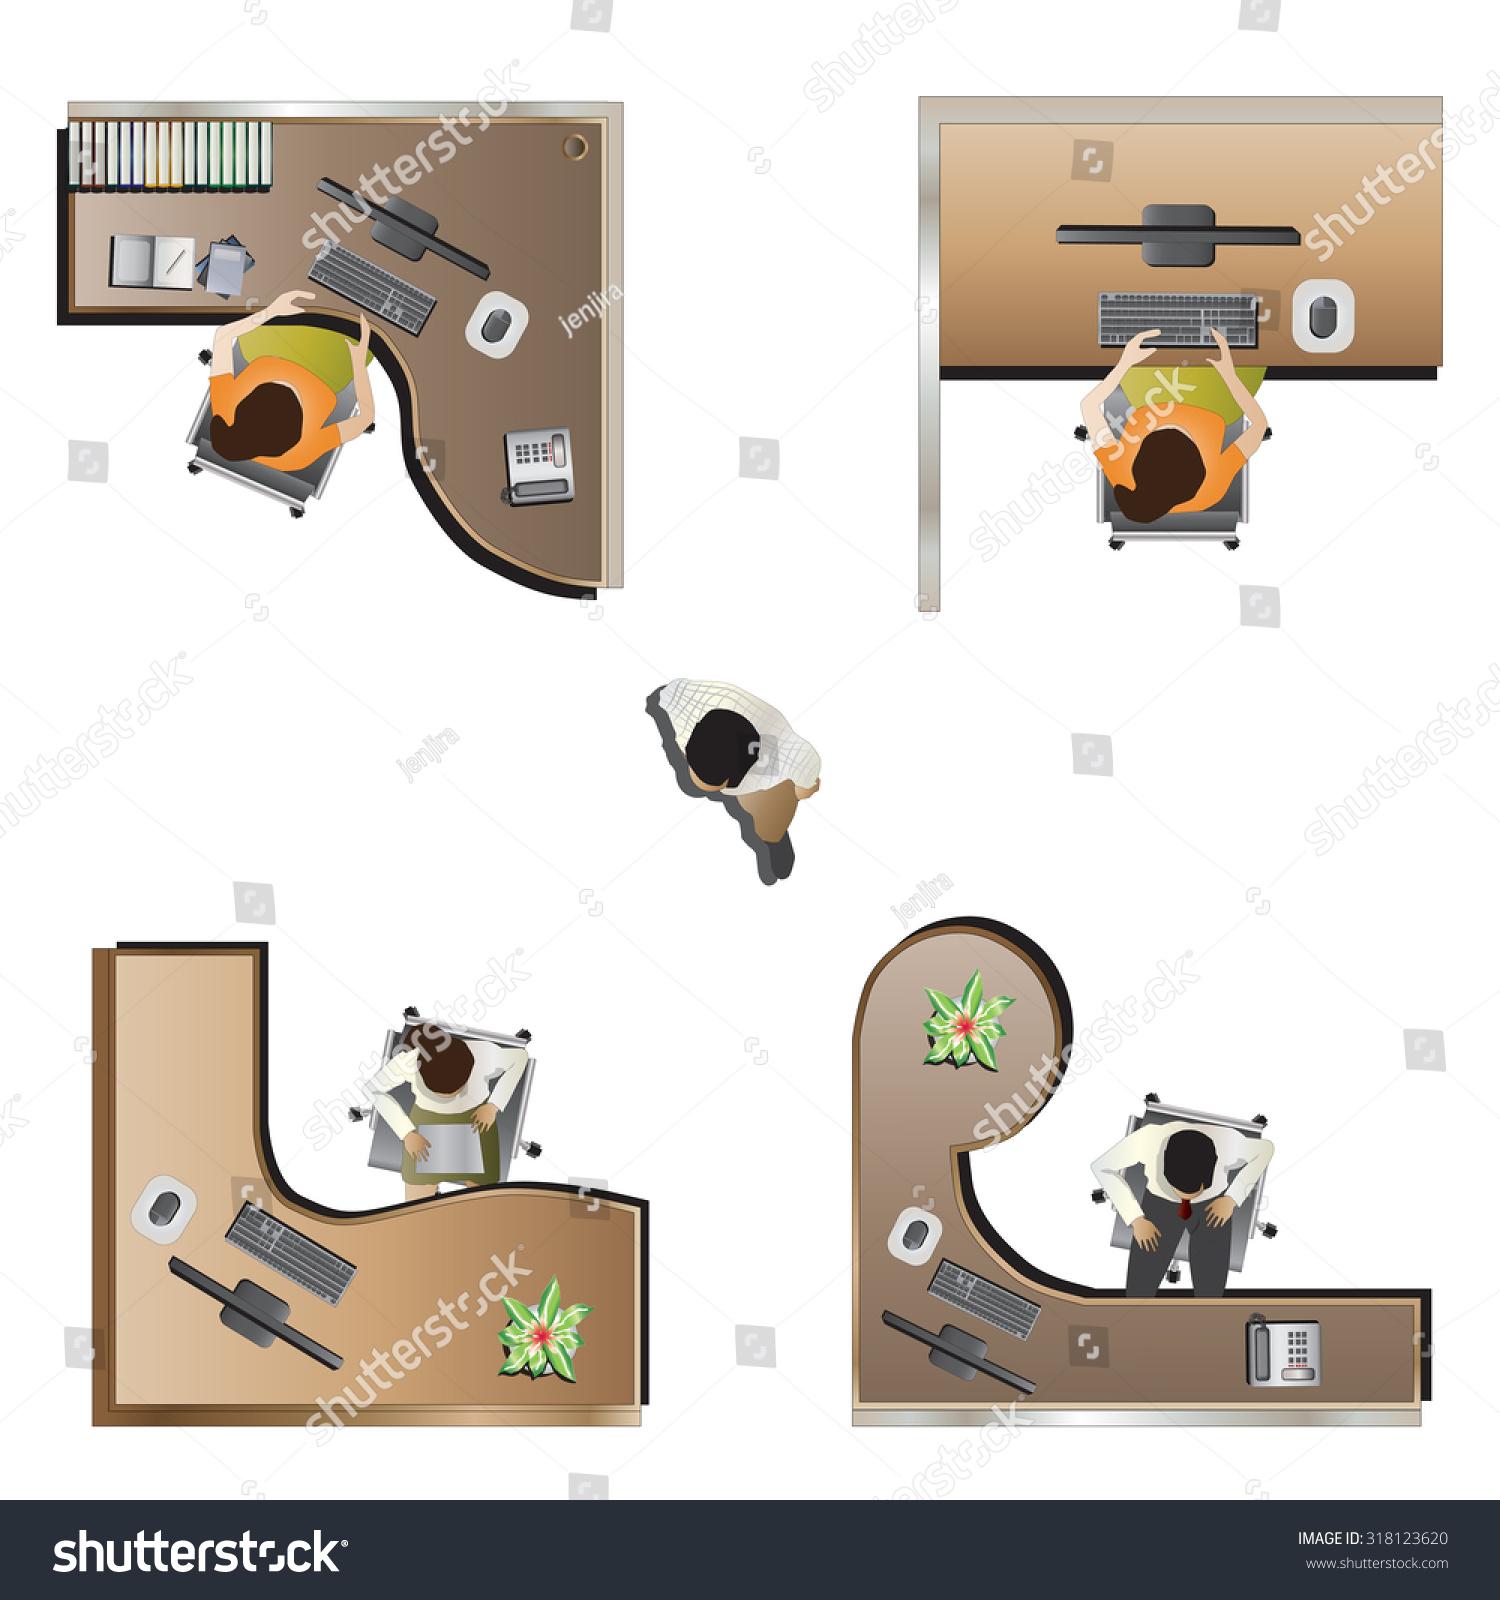 Office furniture top view - Office Furniture Top View Set 9 For Interior Vector Illustration